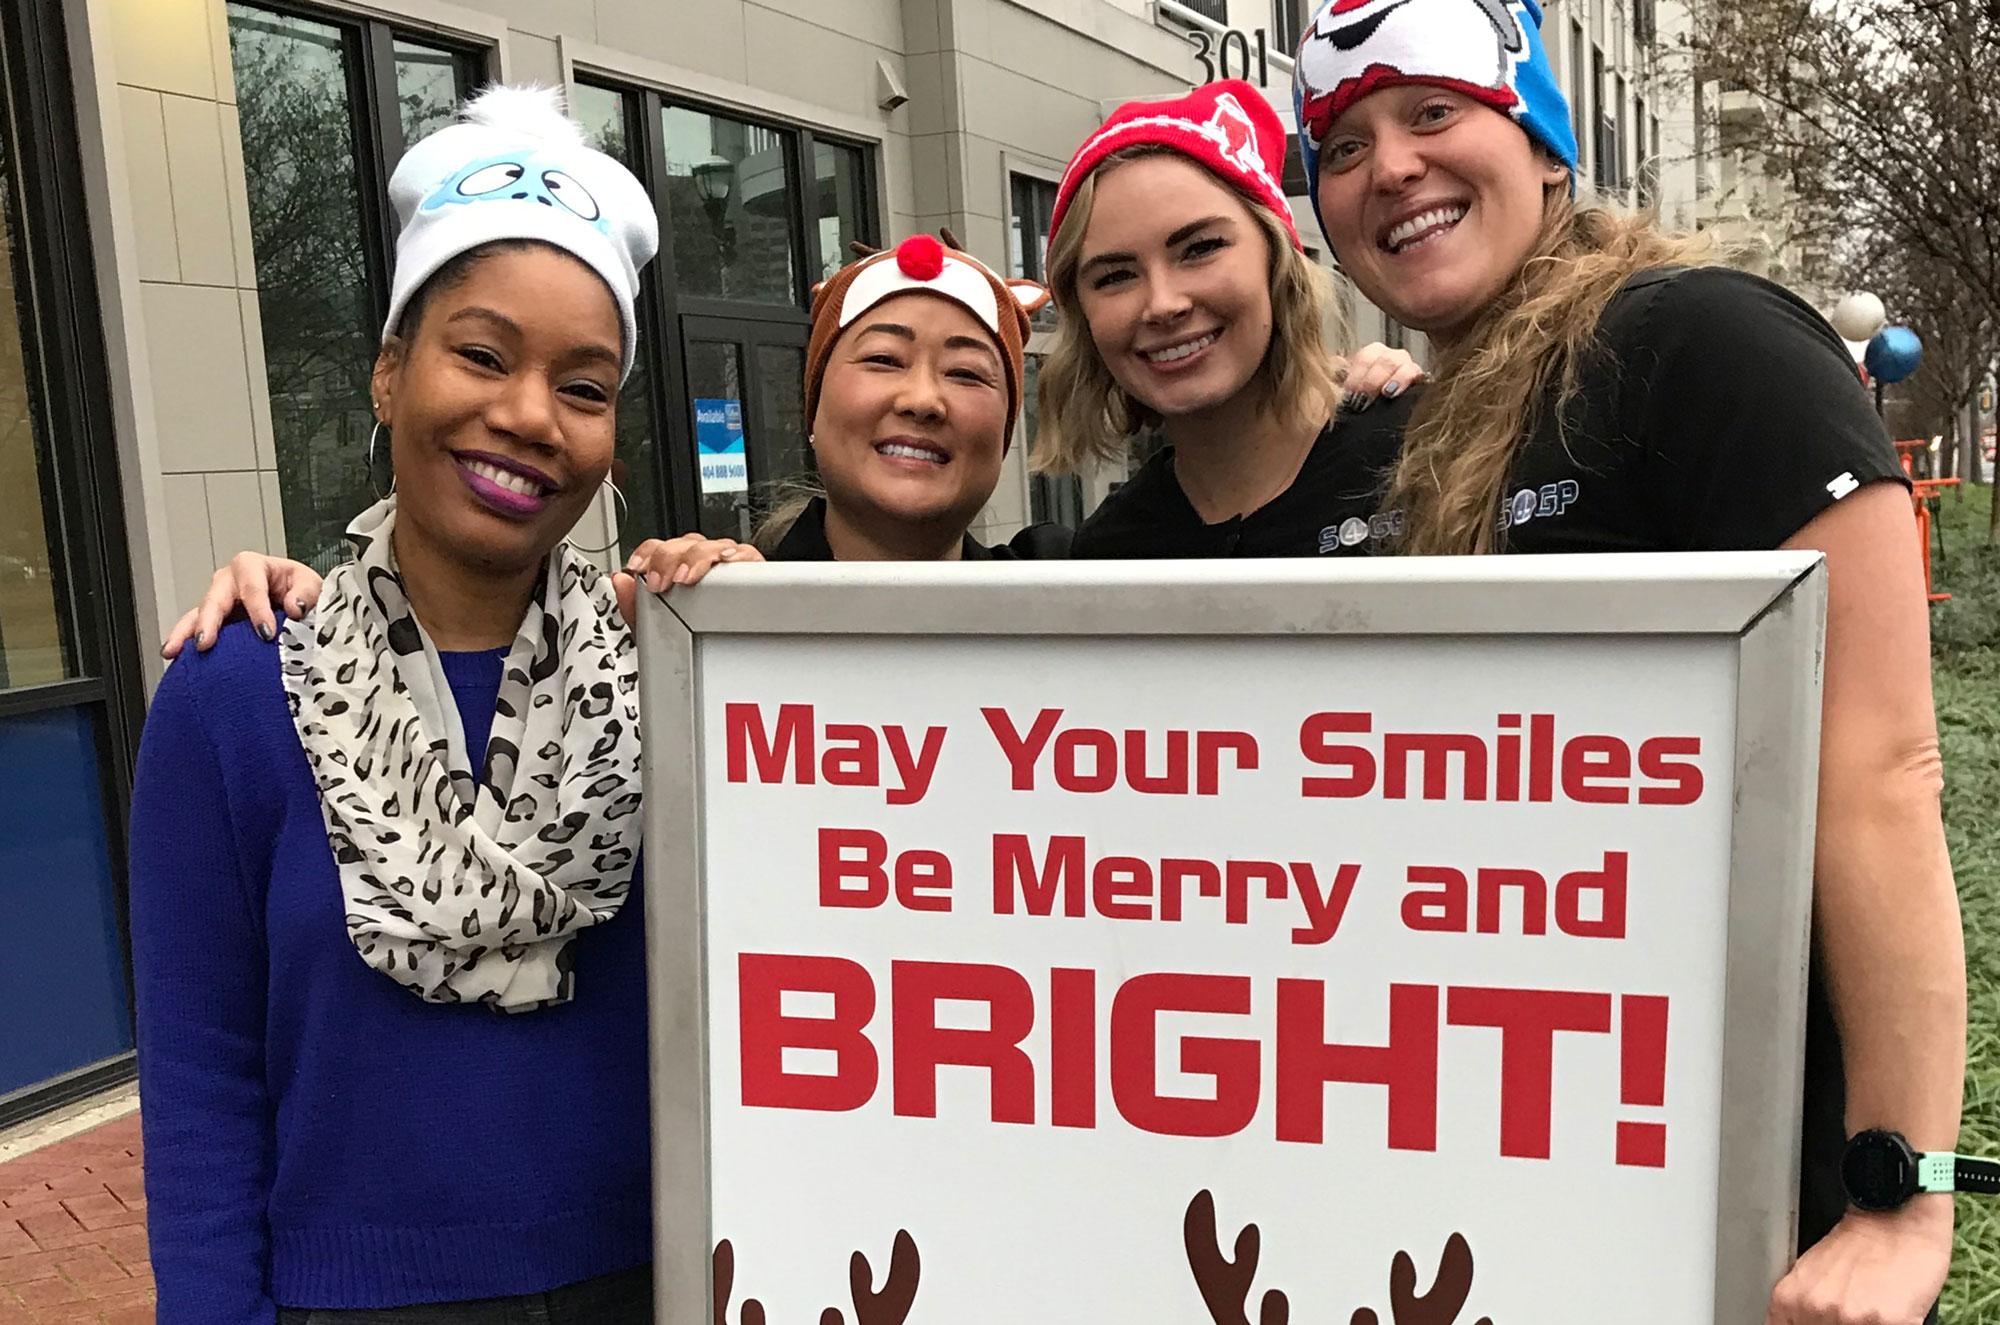 bright-smiles3